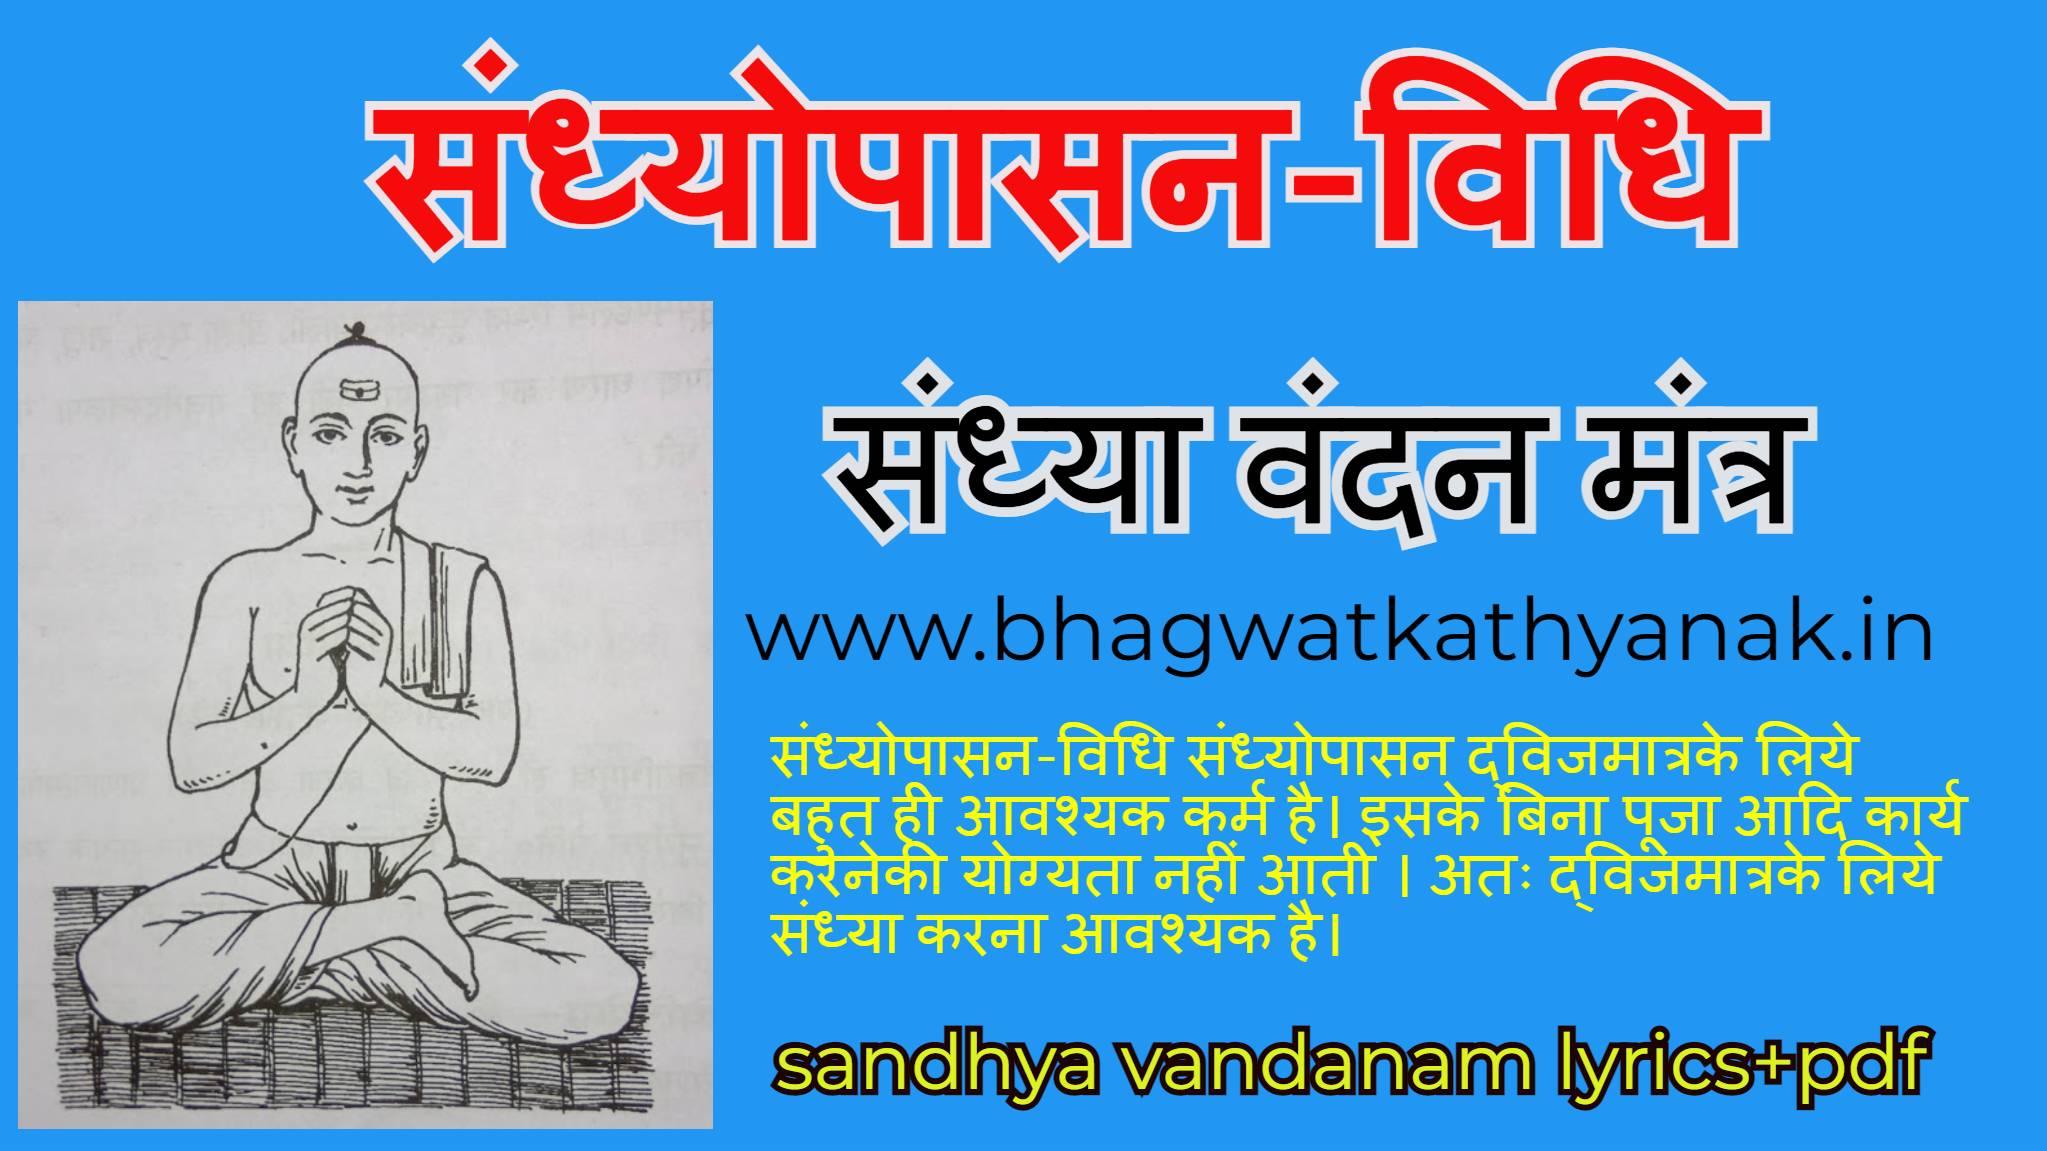 Sandhya Vandana lyrics /संध्योपासन-विधि